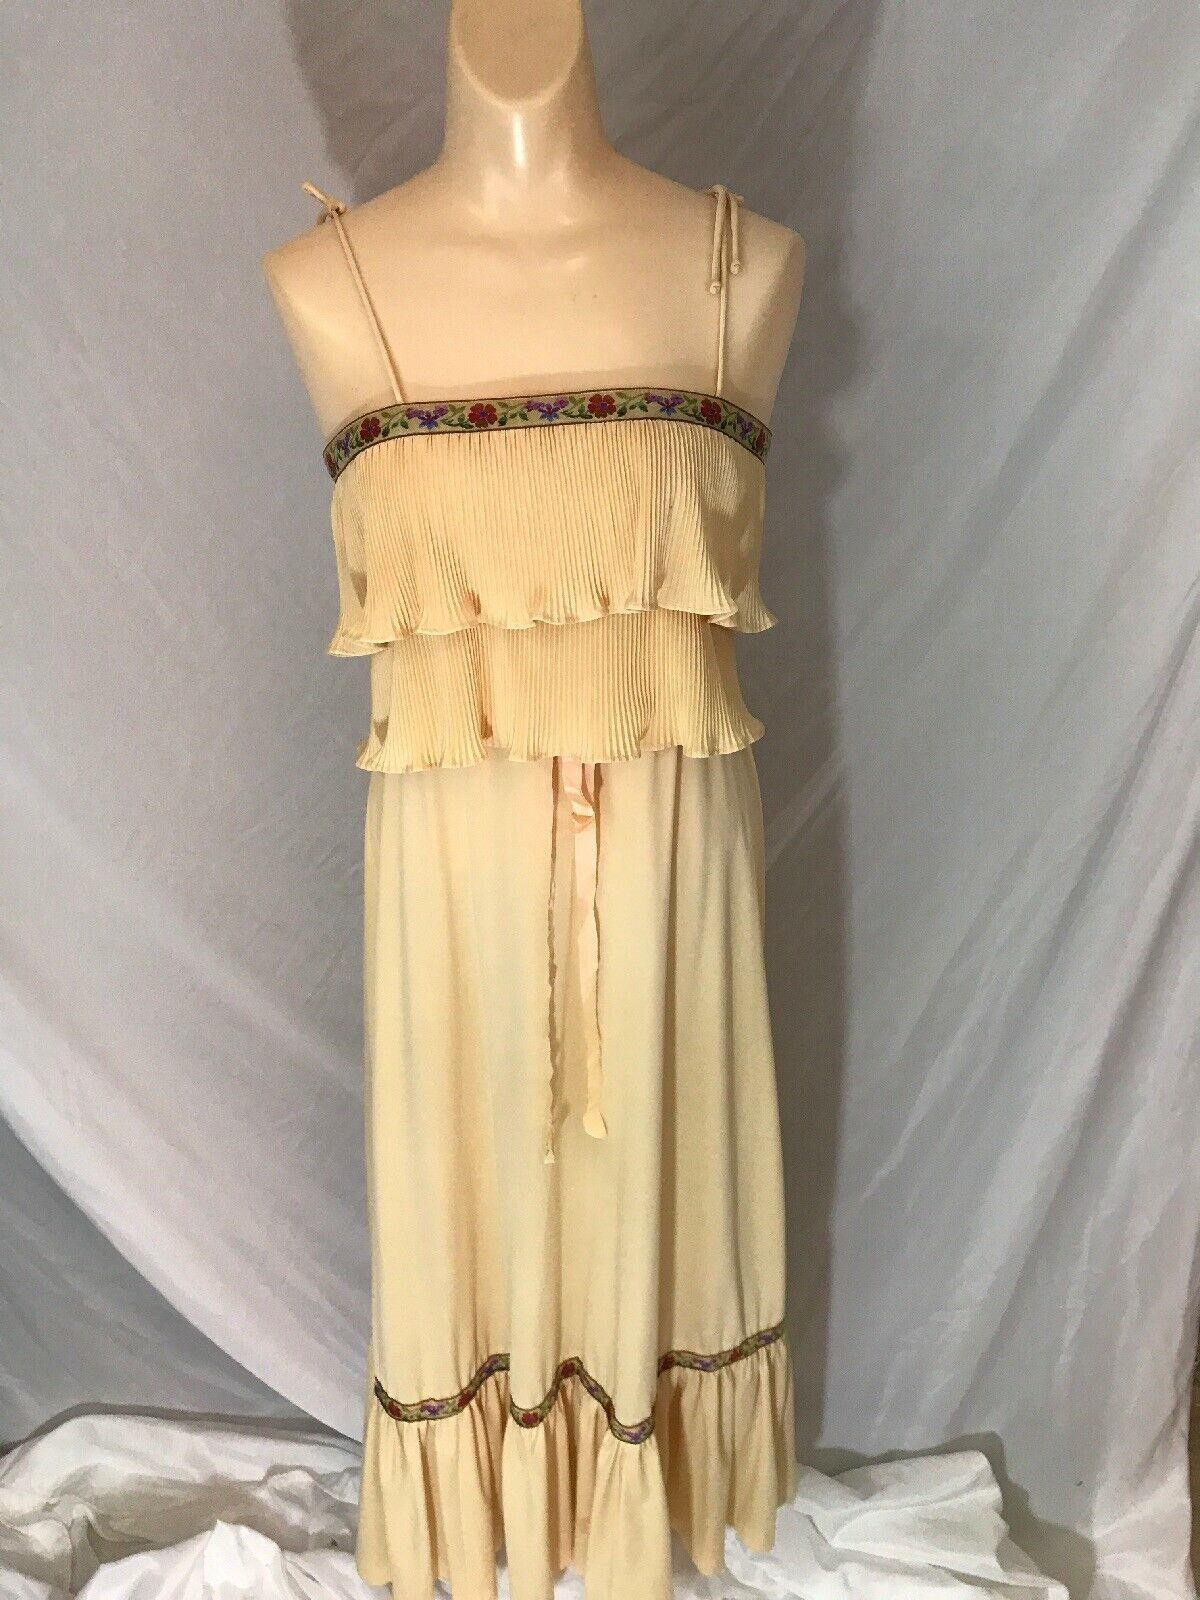 Vtg Womens Spaghetti Strap Maxi Dress Tan Brown Beige Floral Handmade Polyester